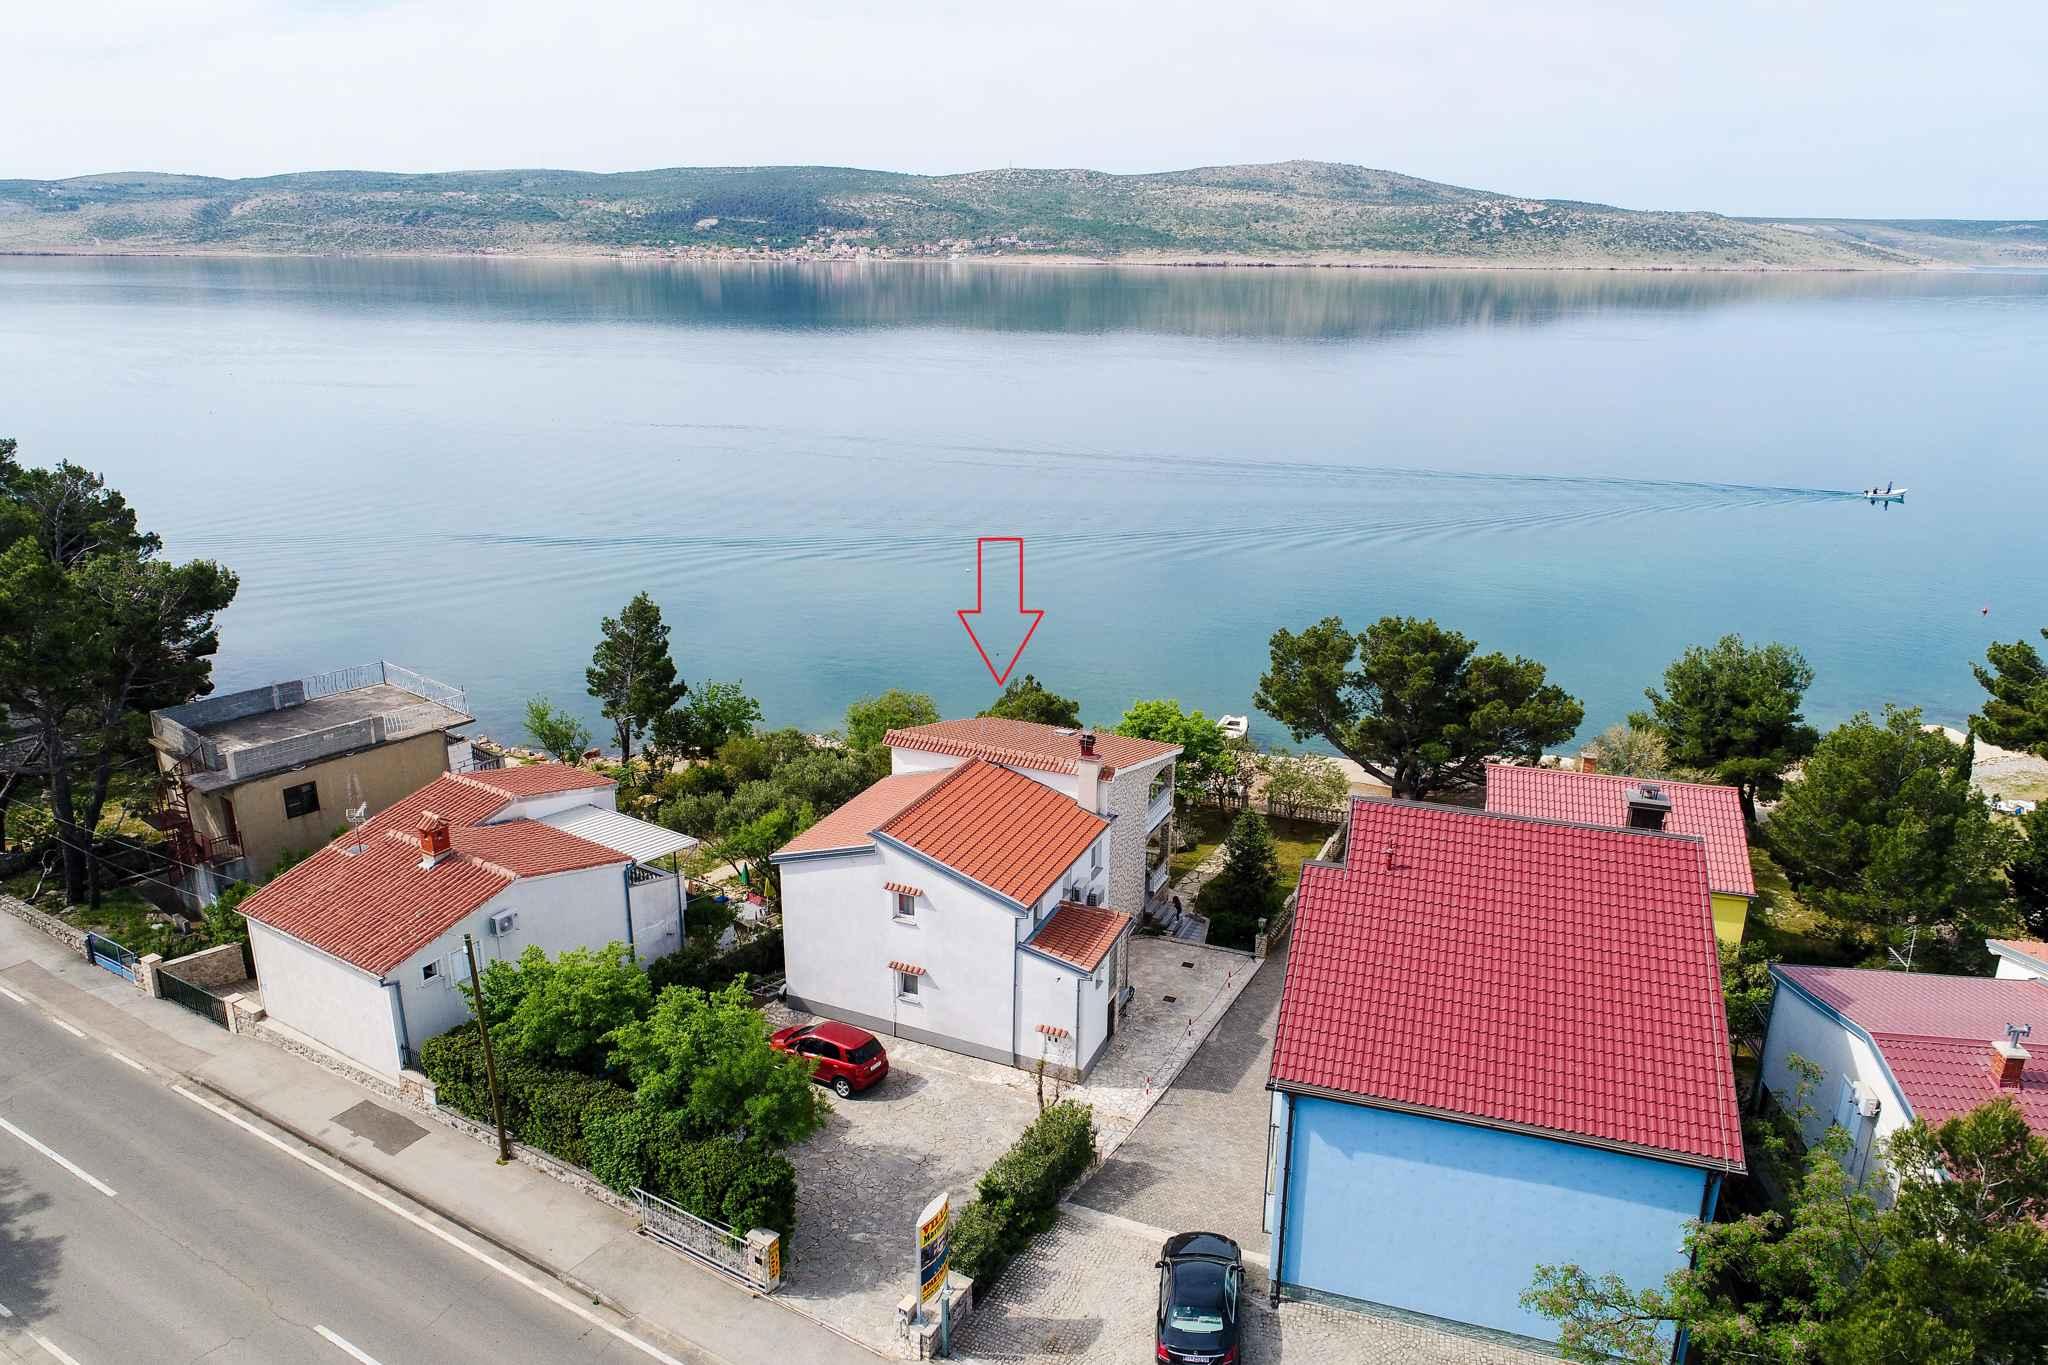 Ferienwohnung mit Panoramameerblick (287921), Starigrad Paklenica, , Dalmatien, Kroatien, Bild 6